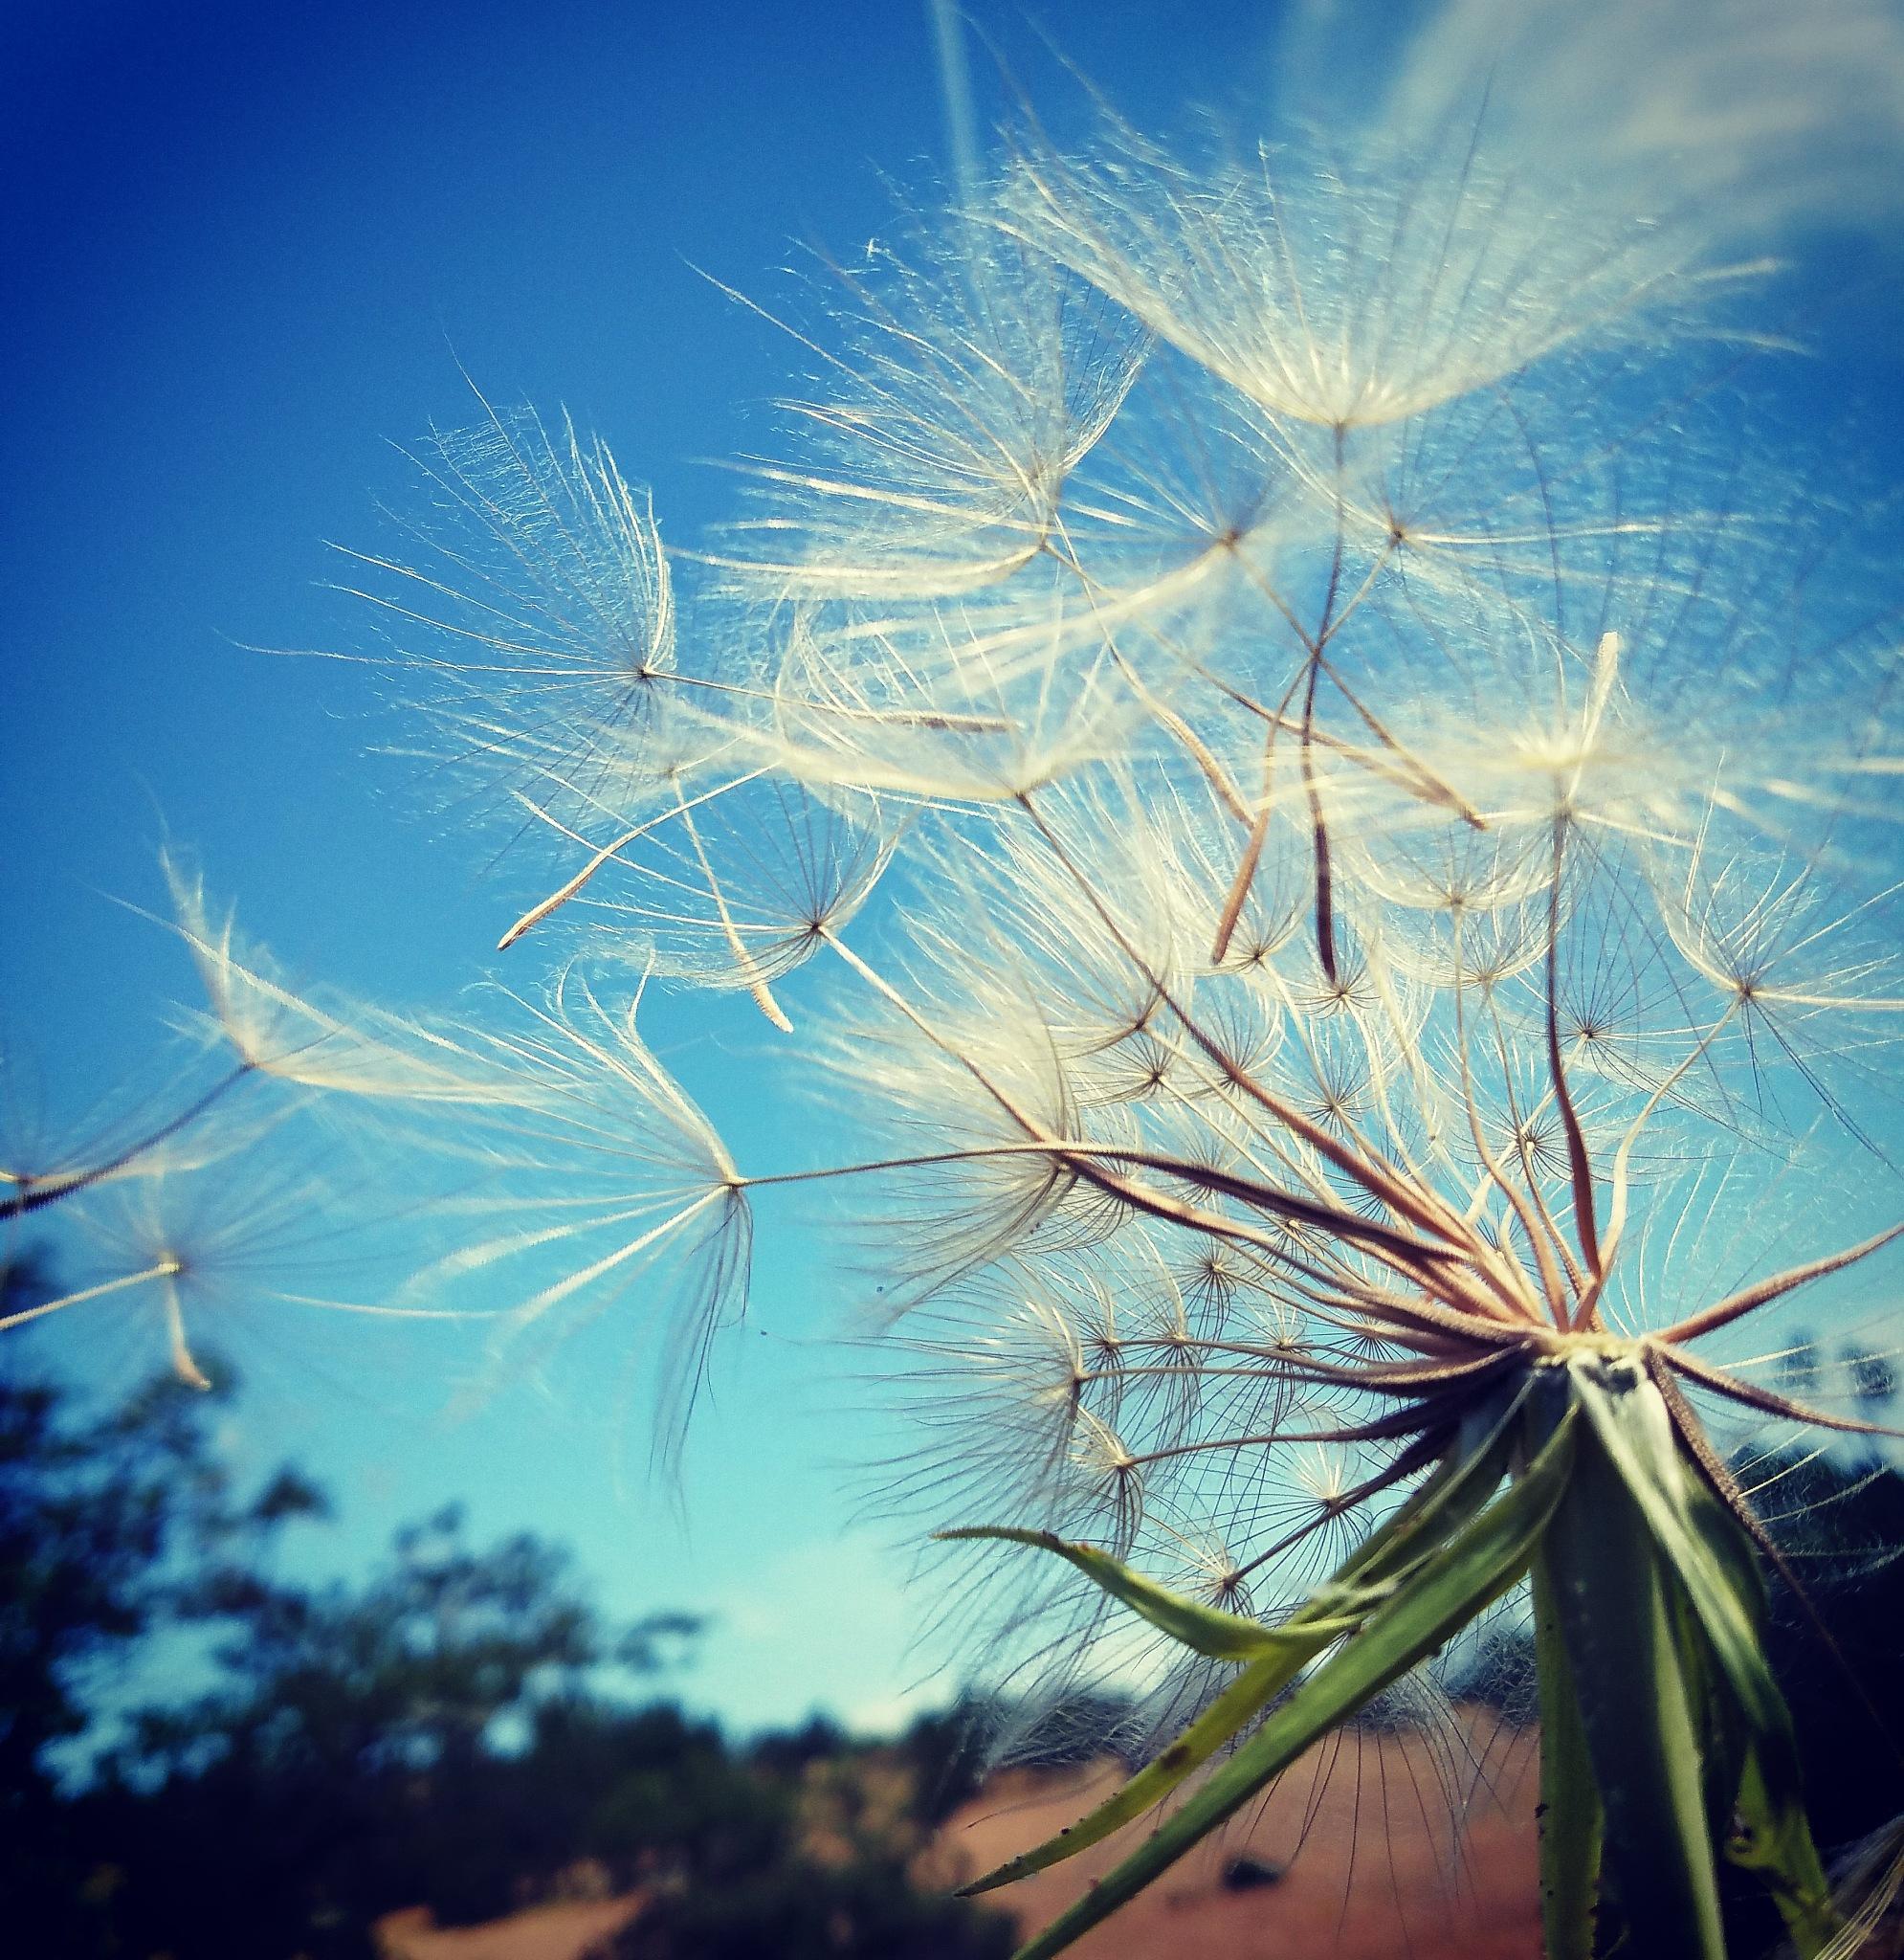 Make A Wish by Shari Lynn Foster